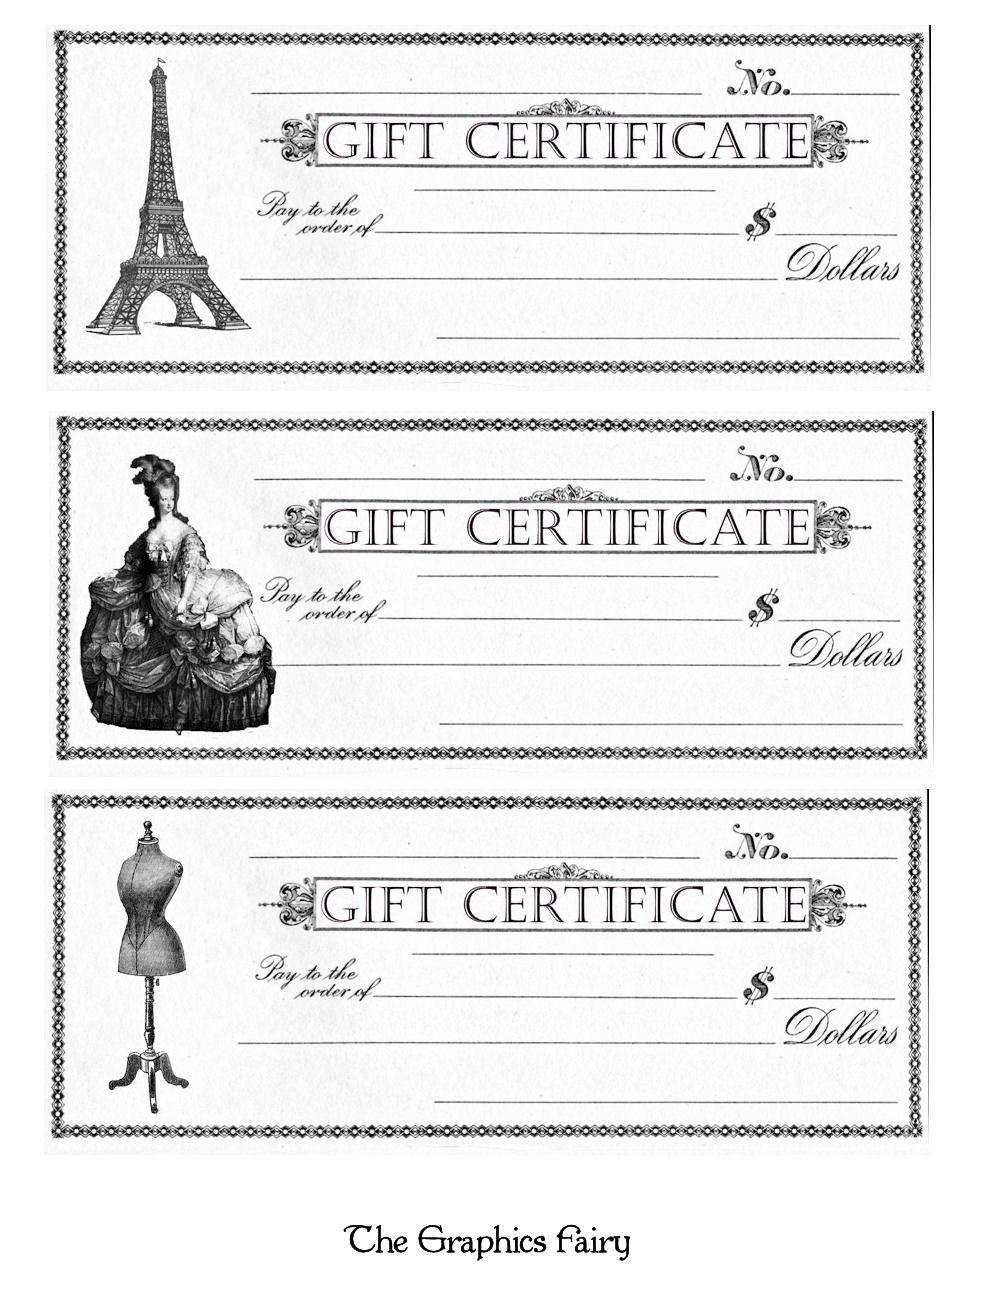 free printable gift certificates ステッカー と ラベル